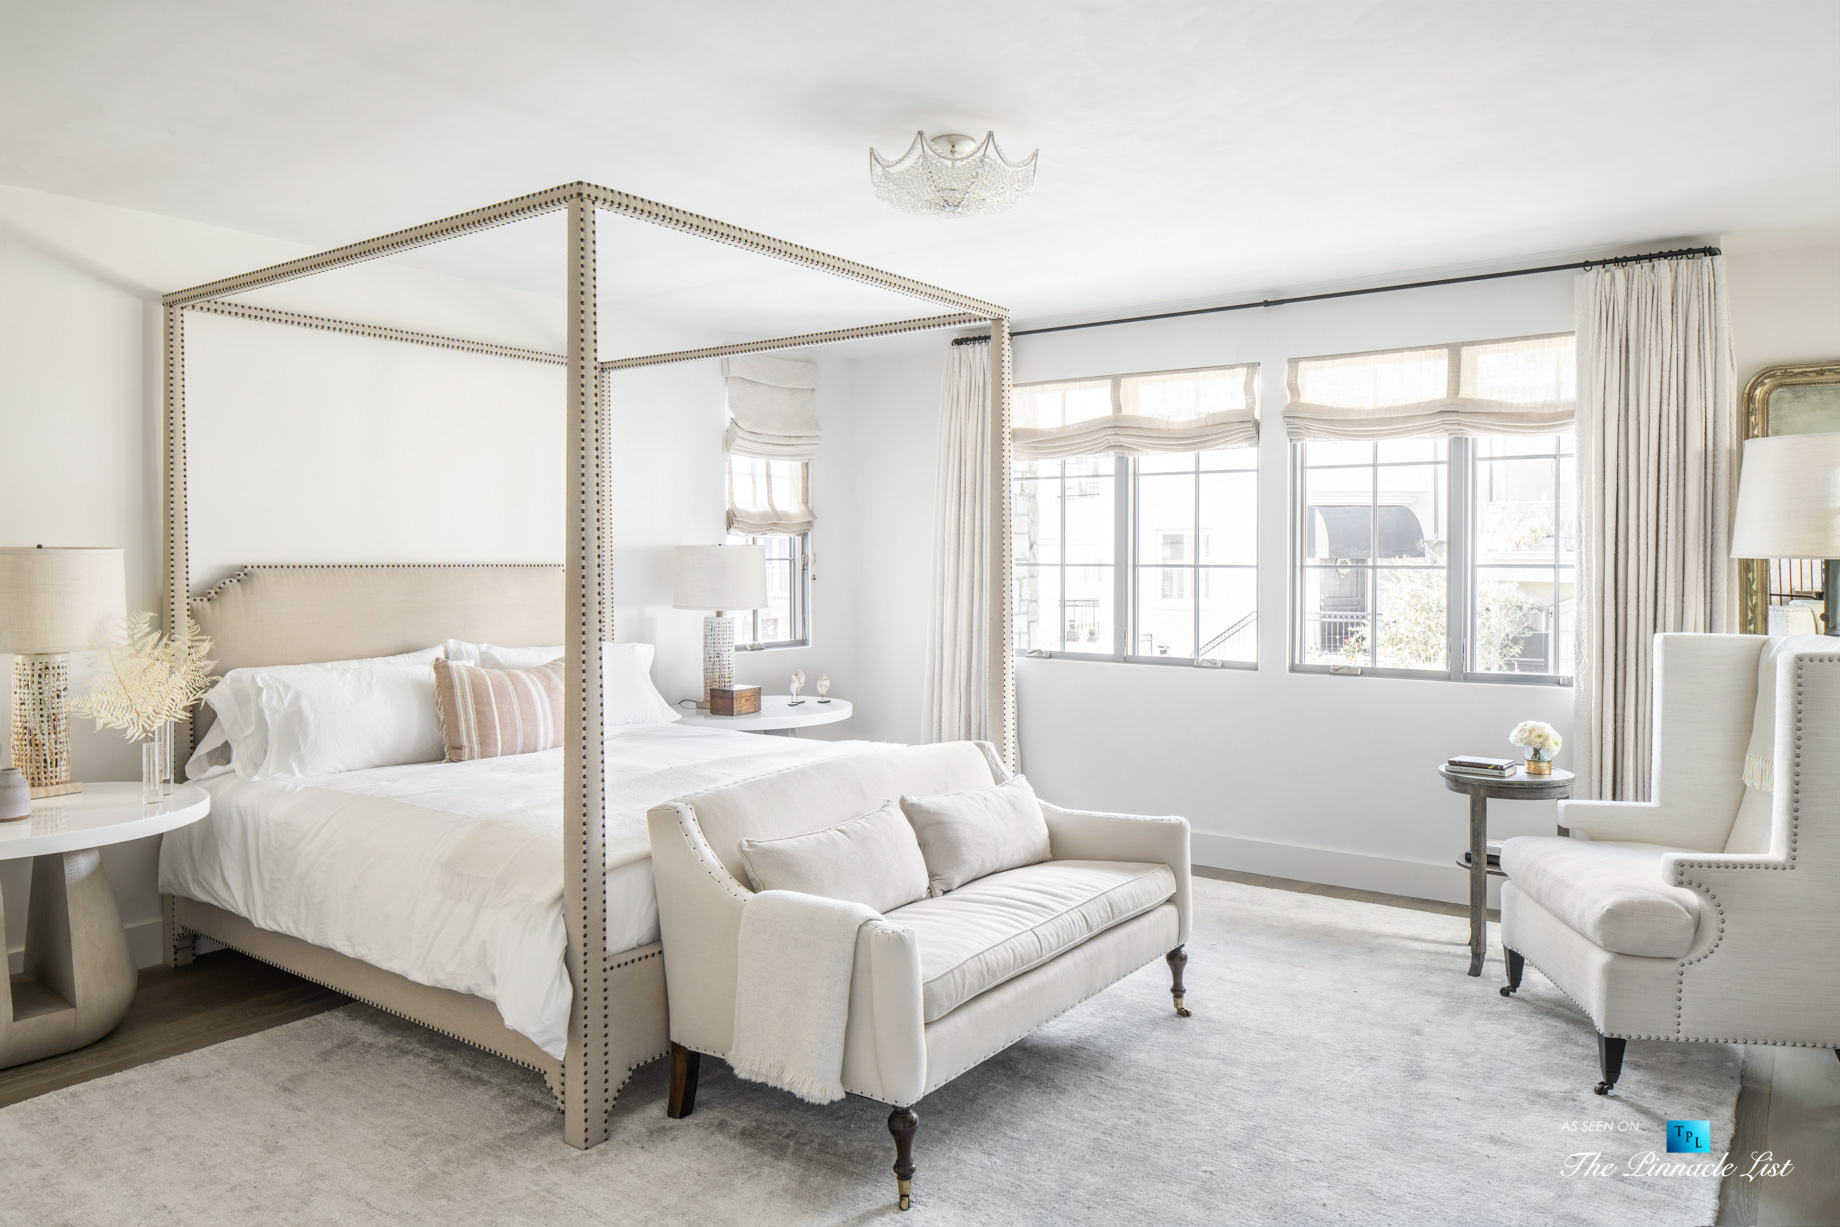 Exquisite Luxury Walk Street Home – 220 8th St, Manhattan Beach, CA, USA – Master Bedroom